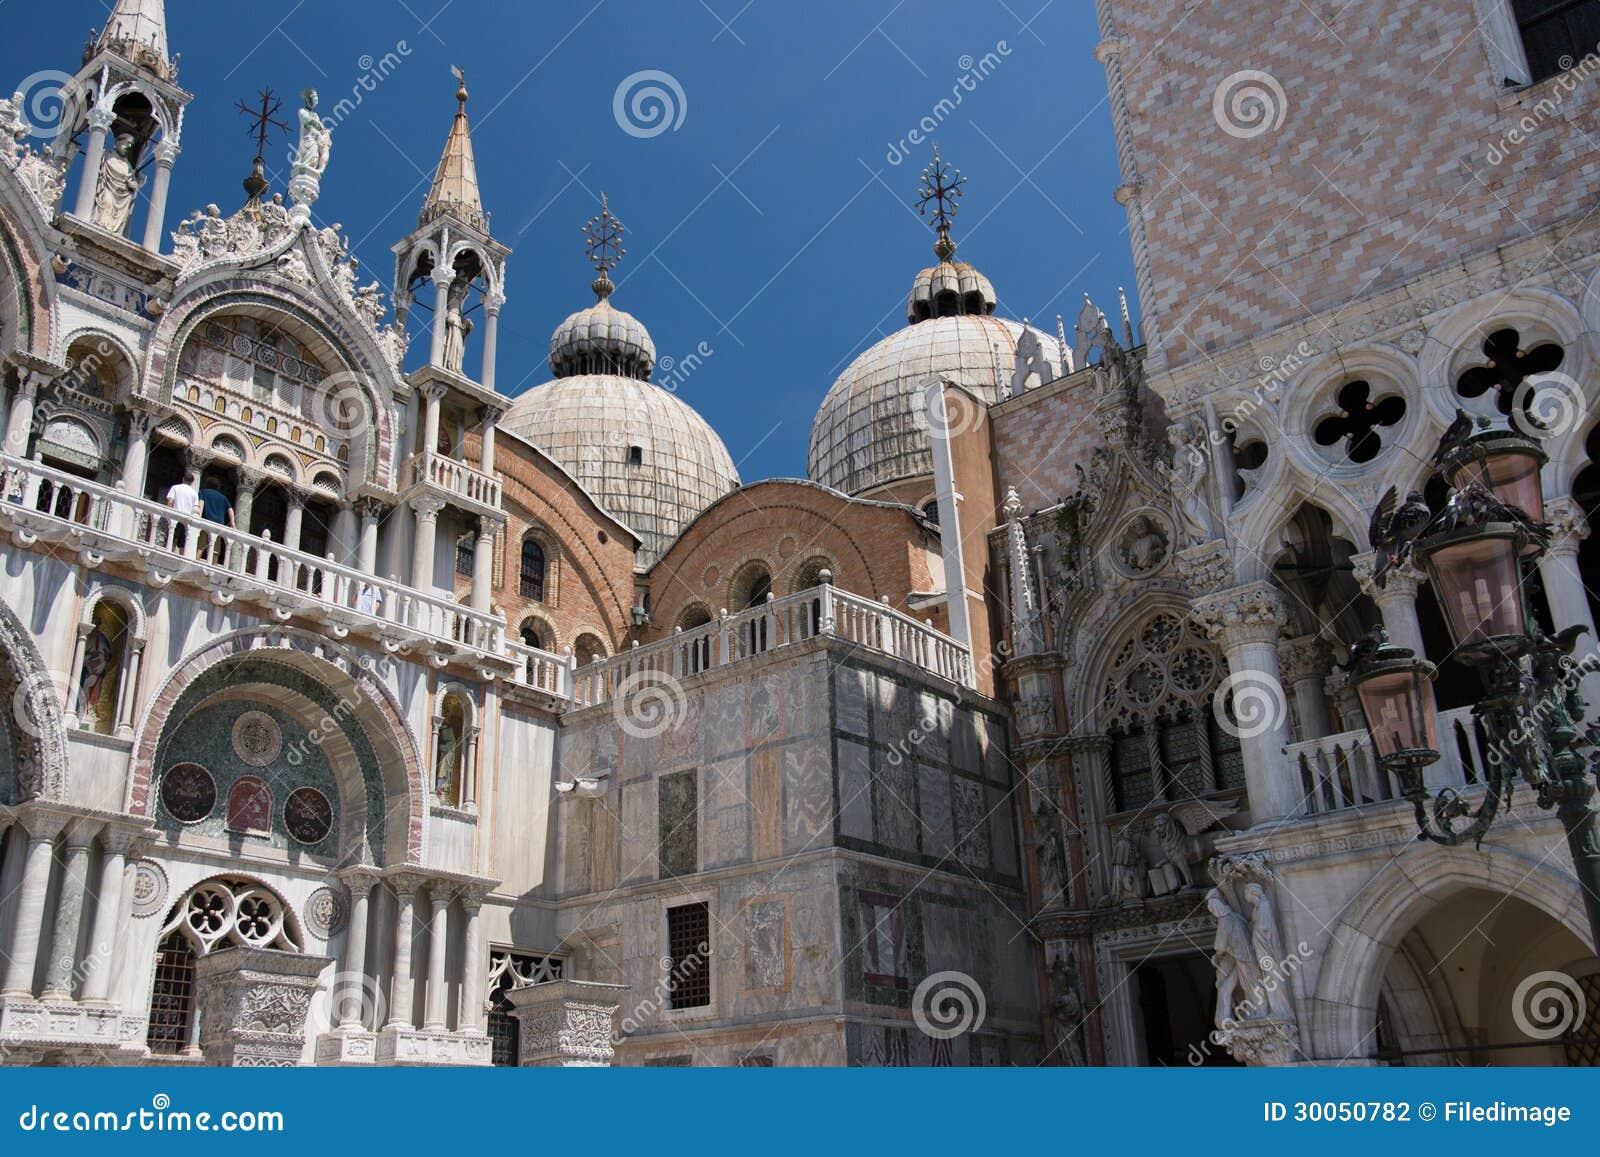 venetian buildings stock photography image 30050782